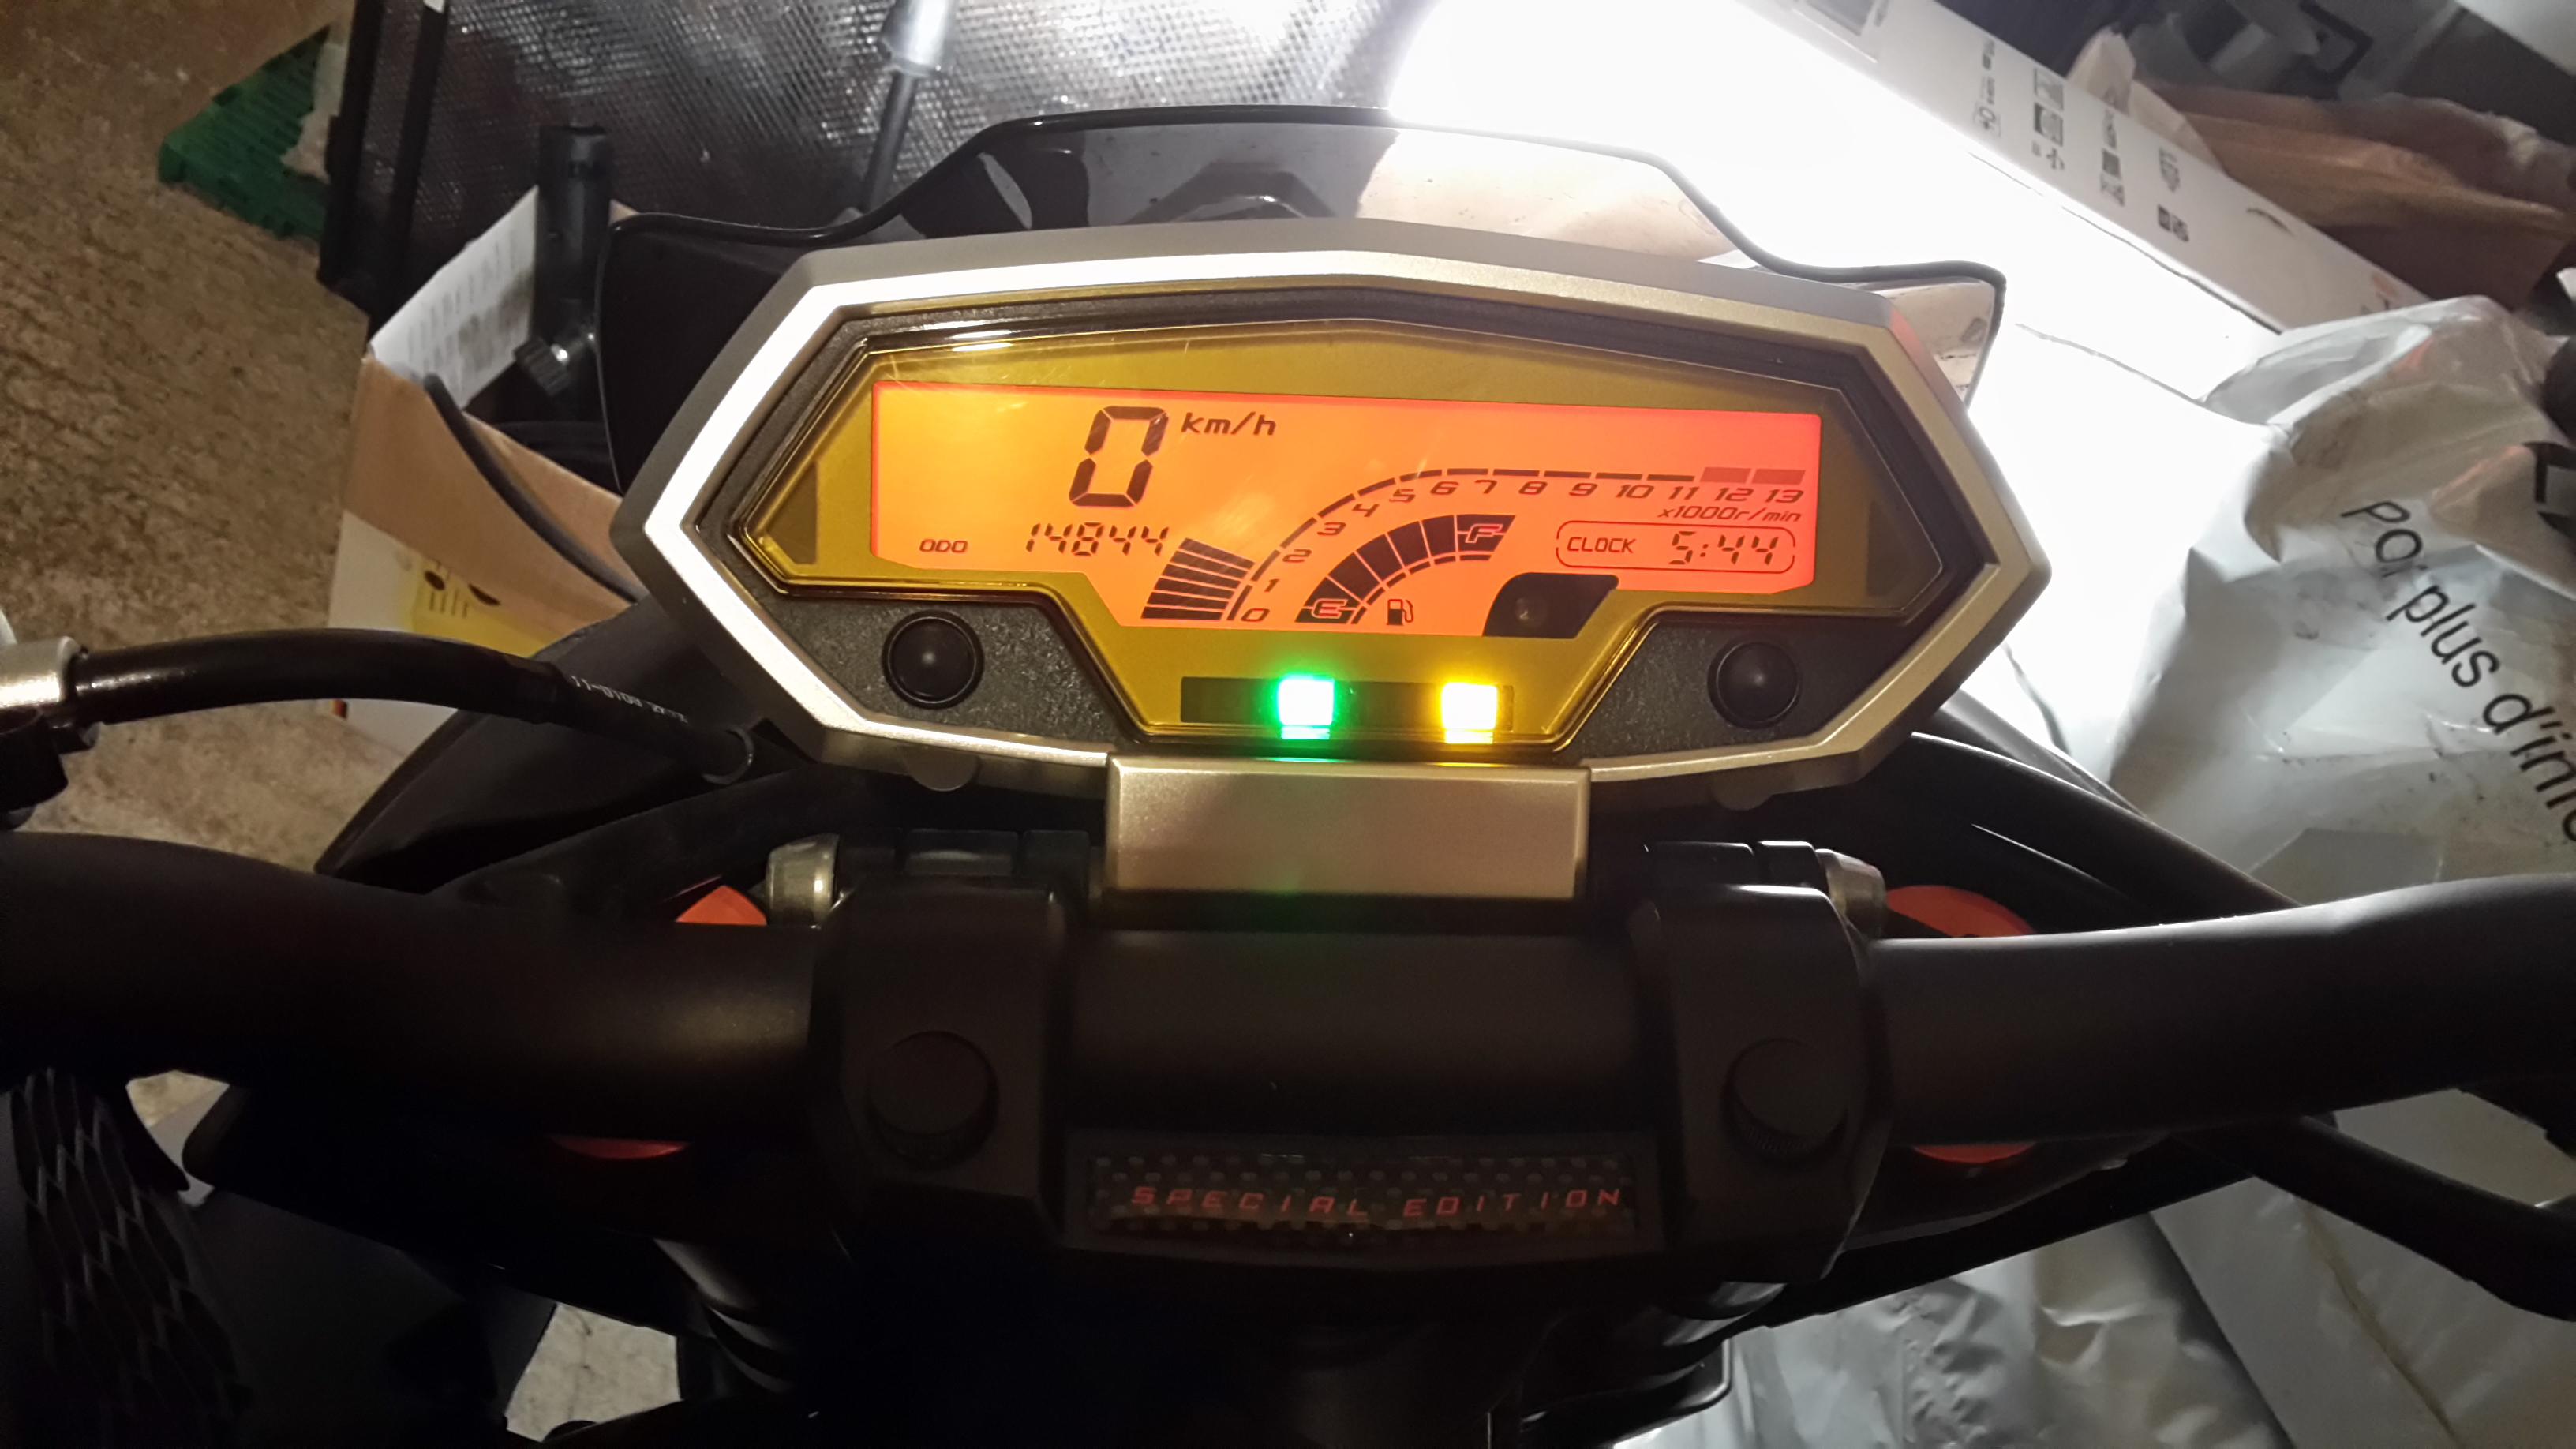 [VENDU] Z1000 ABS 2013 edition speciale 151126052722252944